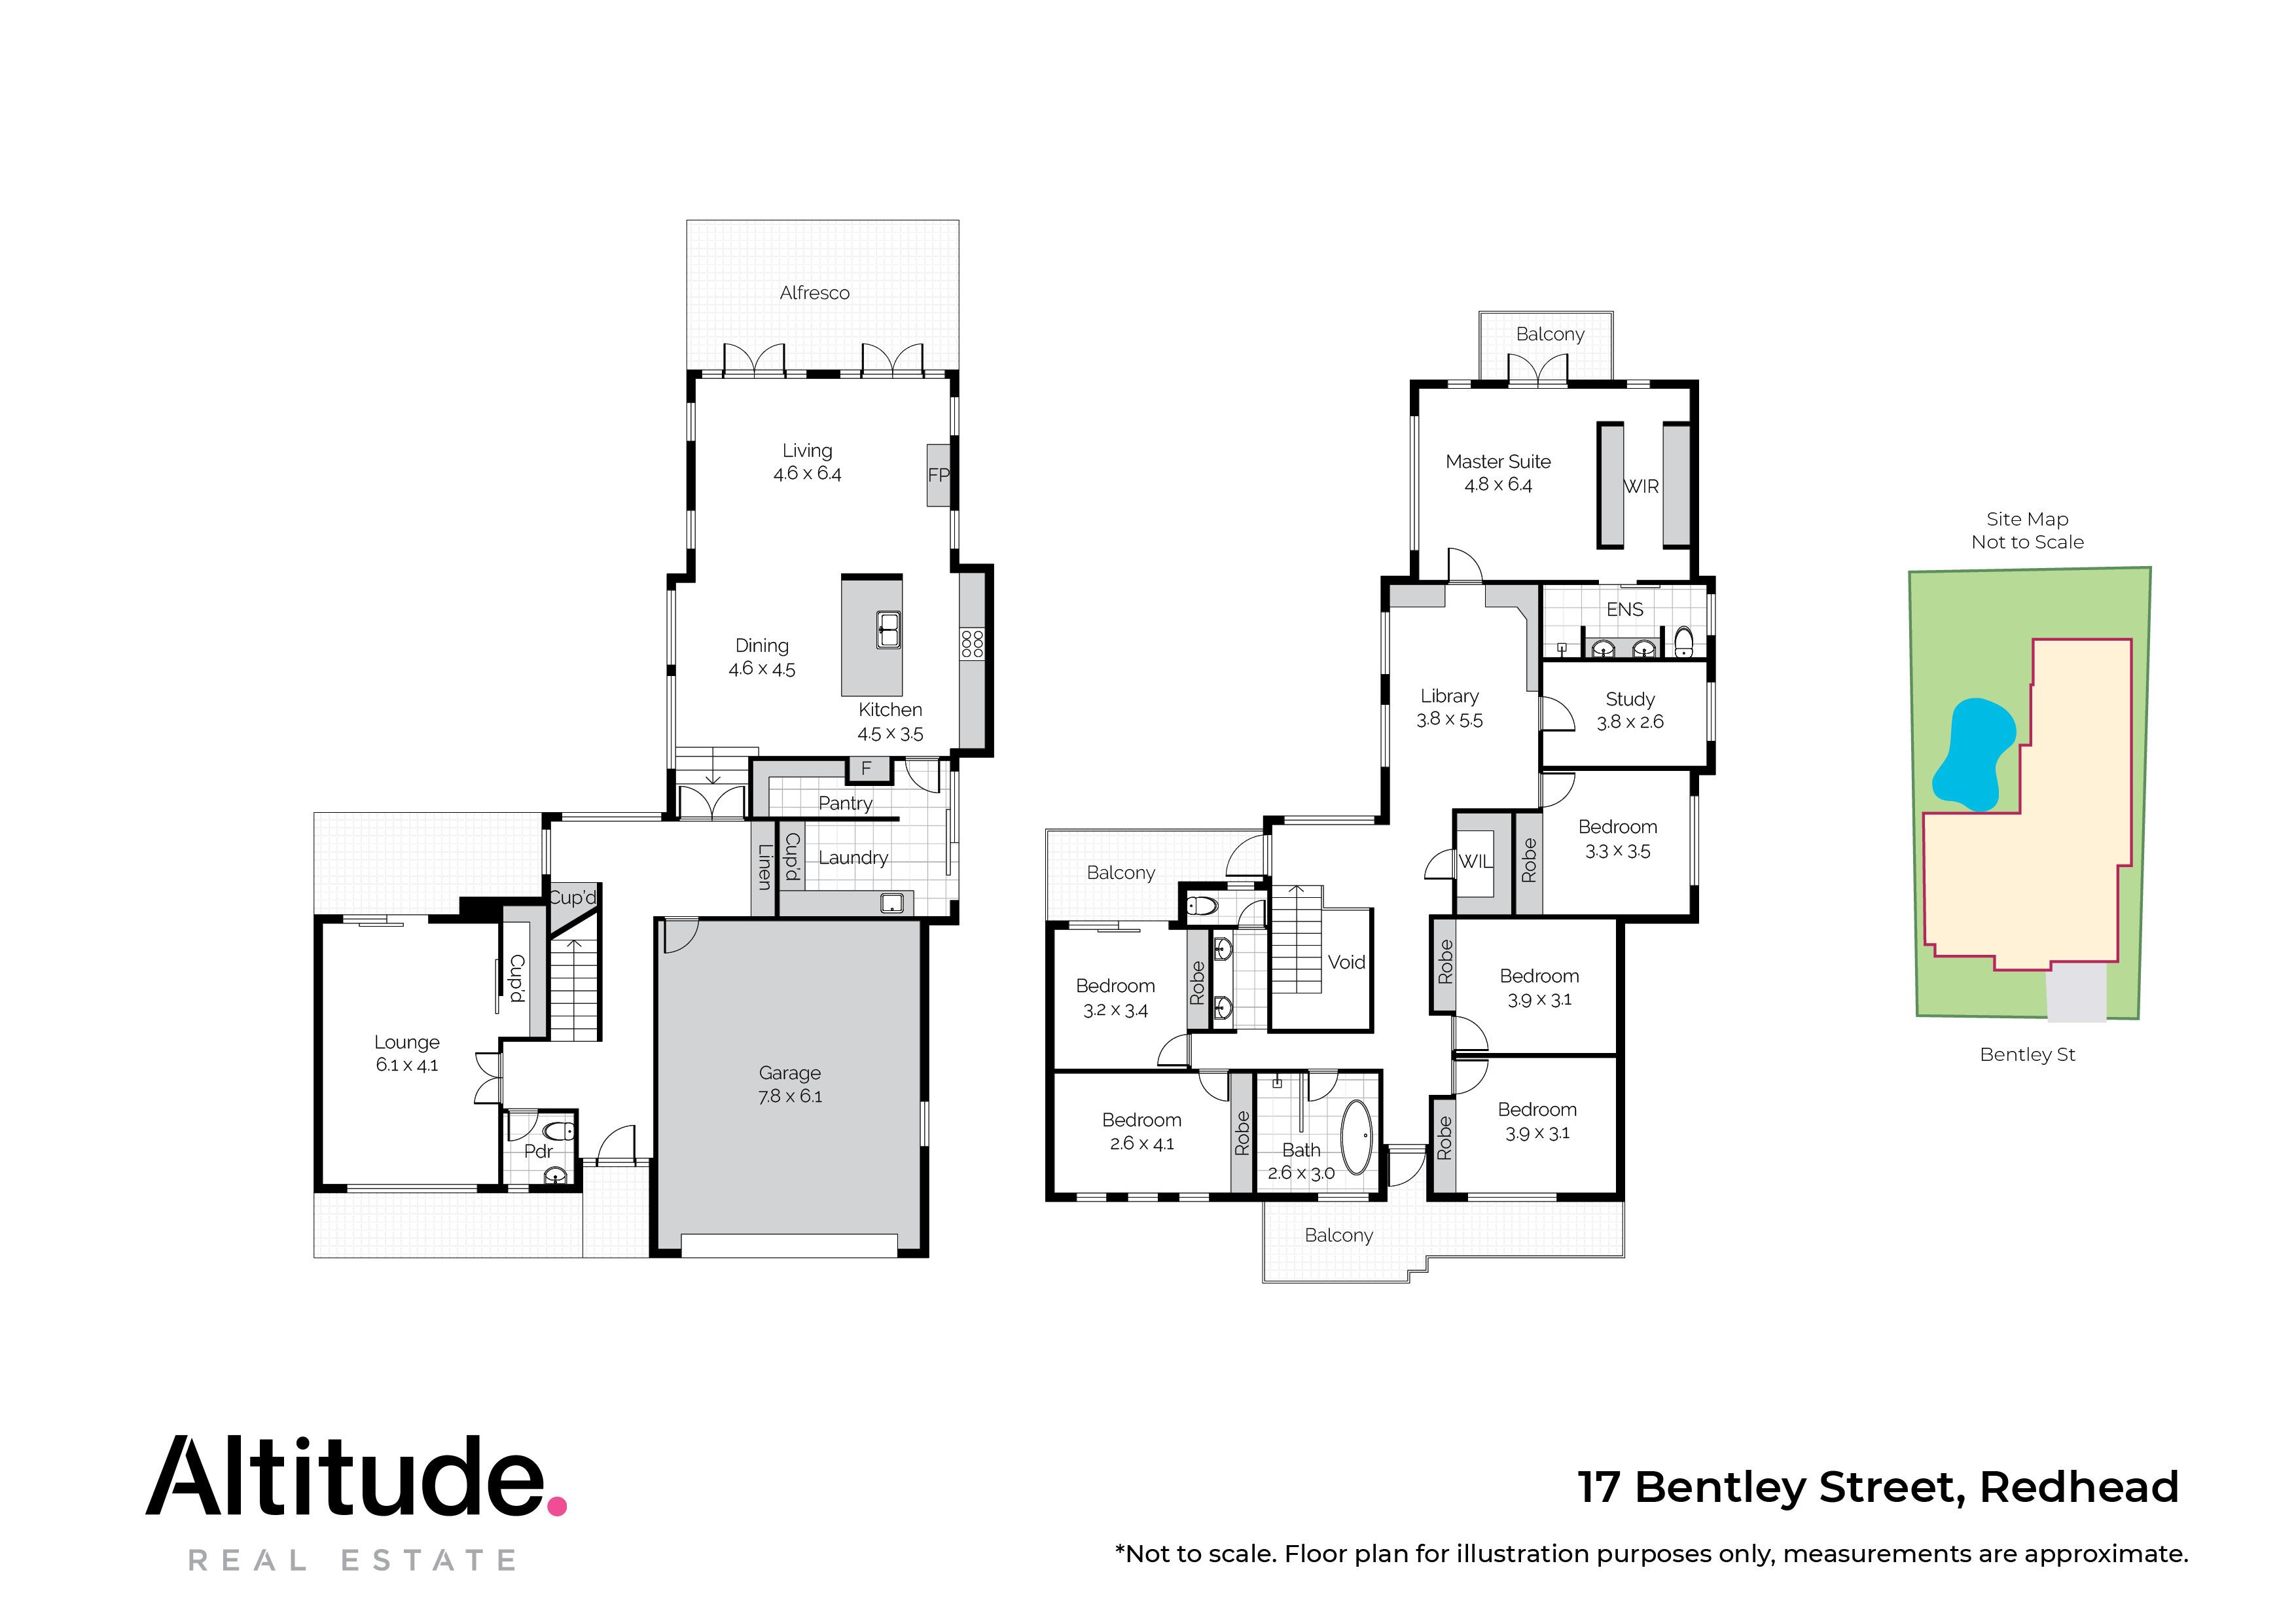 17 Bentley Street, Redhead, NSW 2290